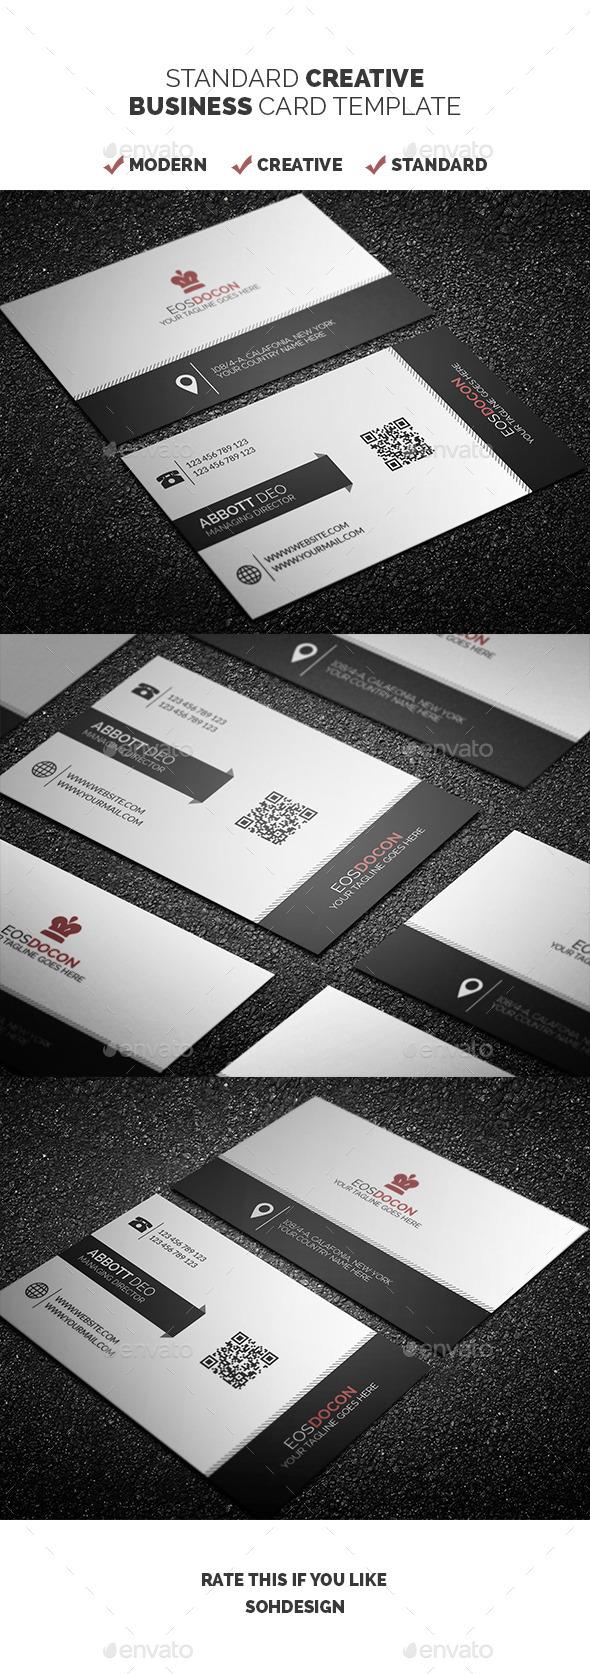 Standard Creative Business Card Template 3 - Creative Business Cards